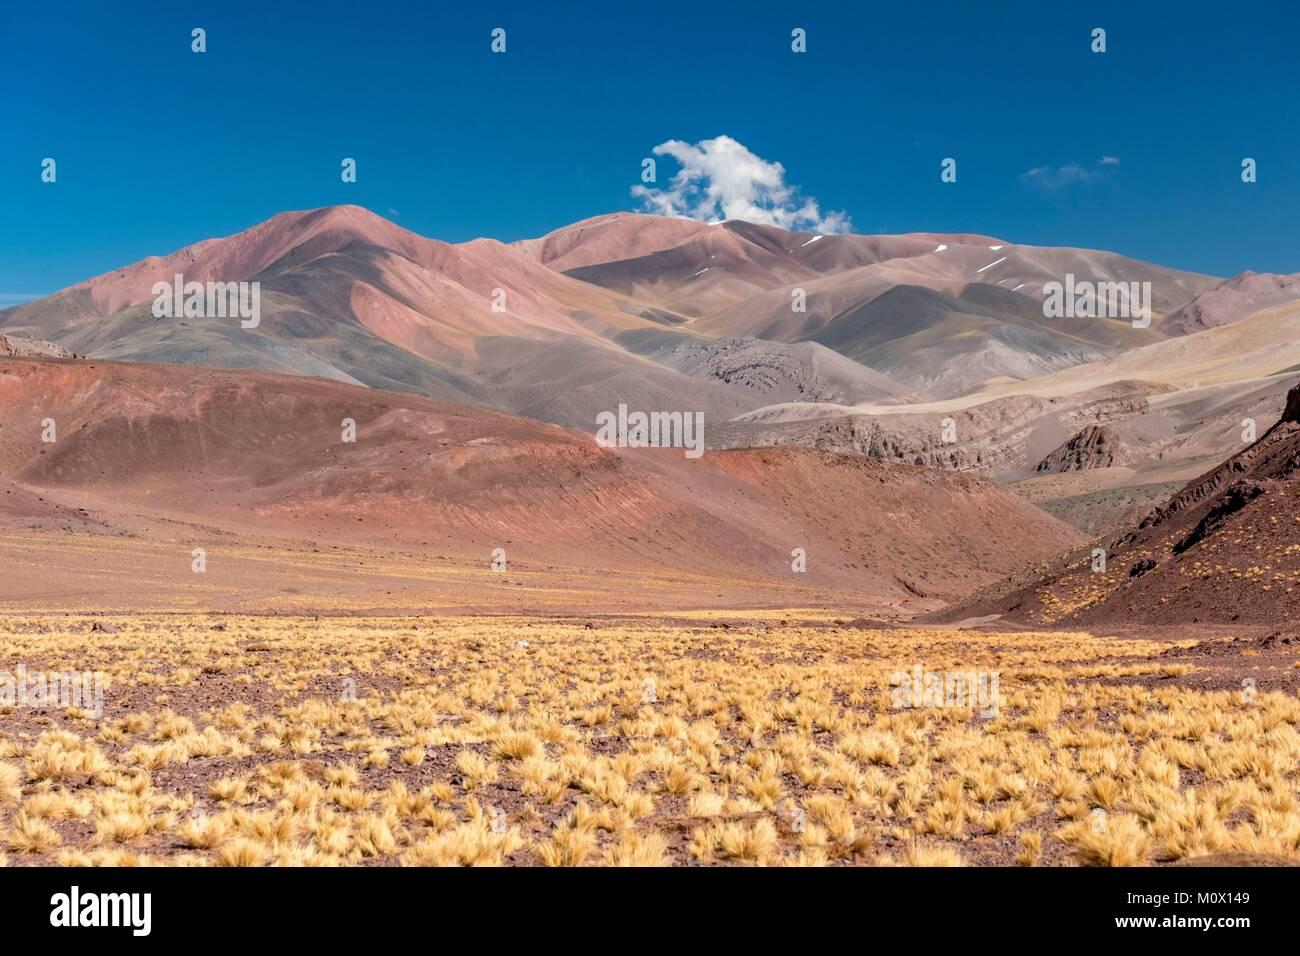 Argentina,La Rioja province,Laguna Brava Provincial Reserve - Stock Image